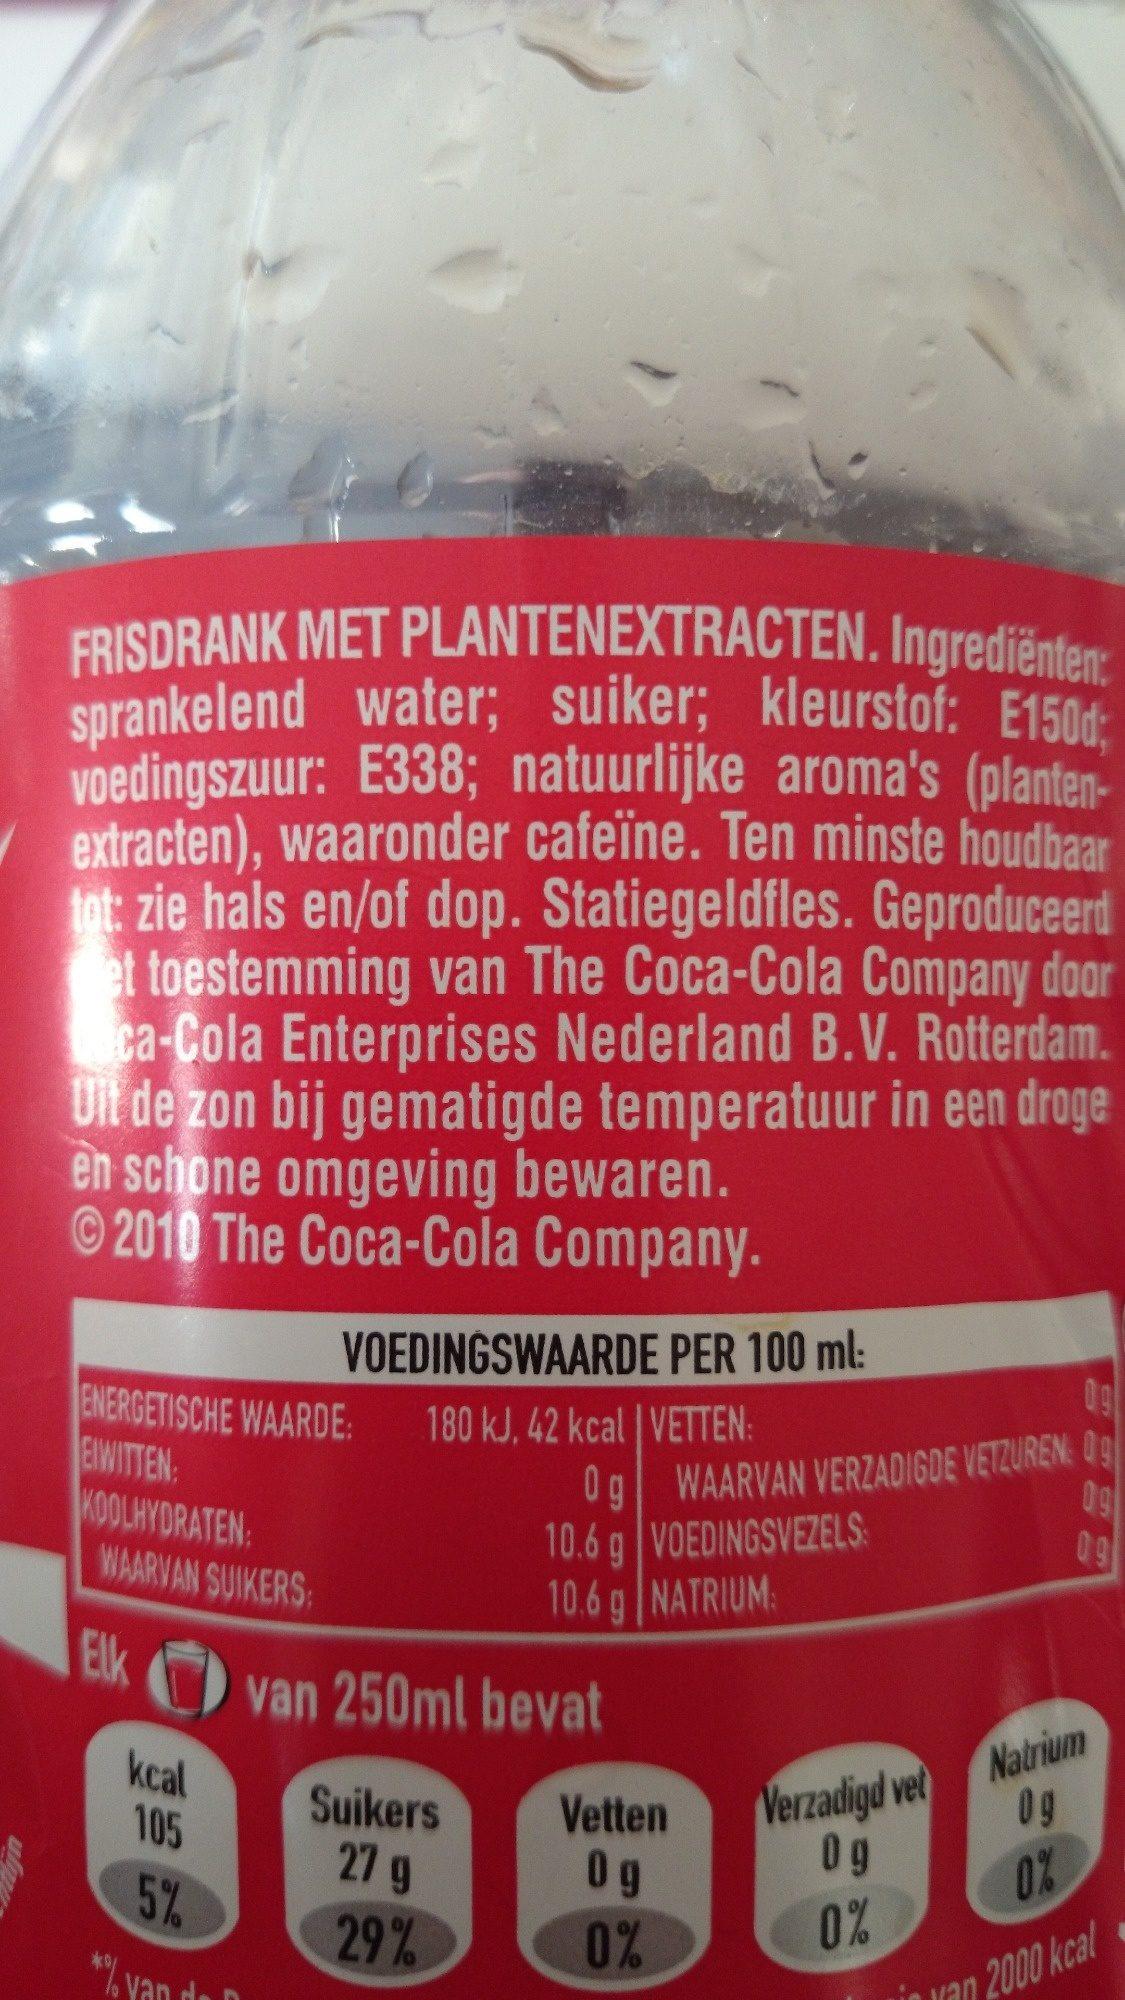 Cola Regular - Coca-cola - 1.5 Liters - Product - nl